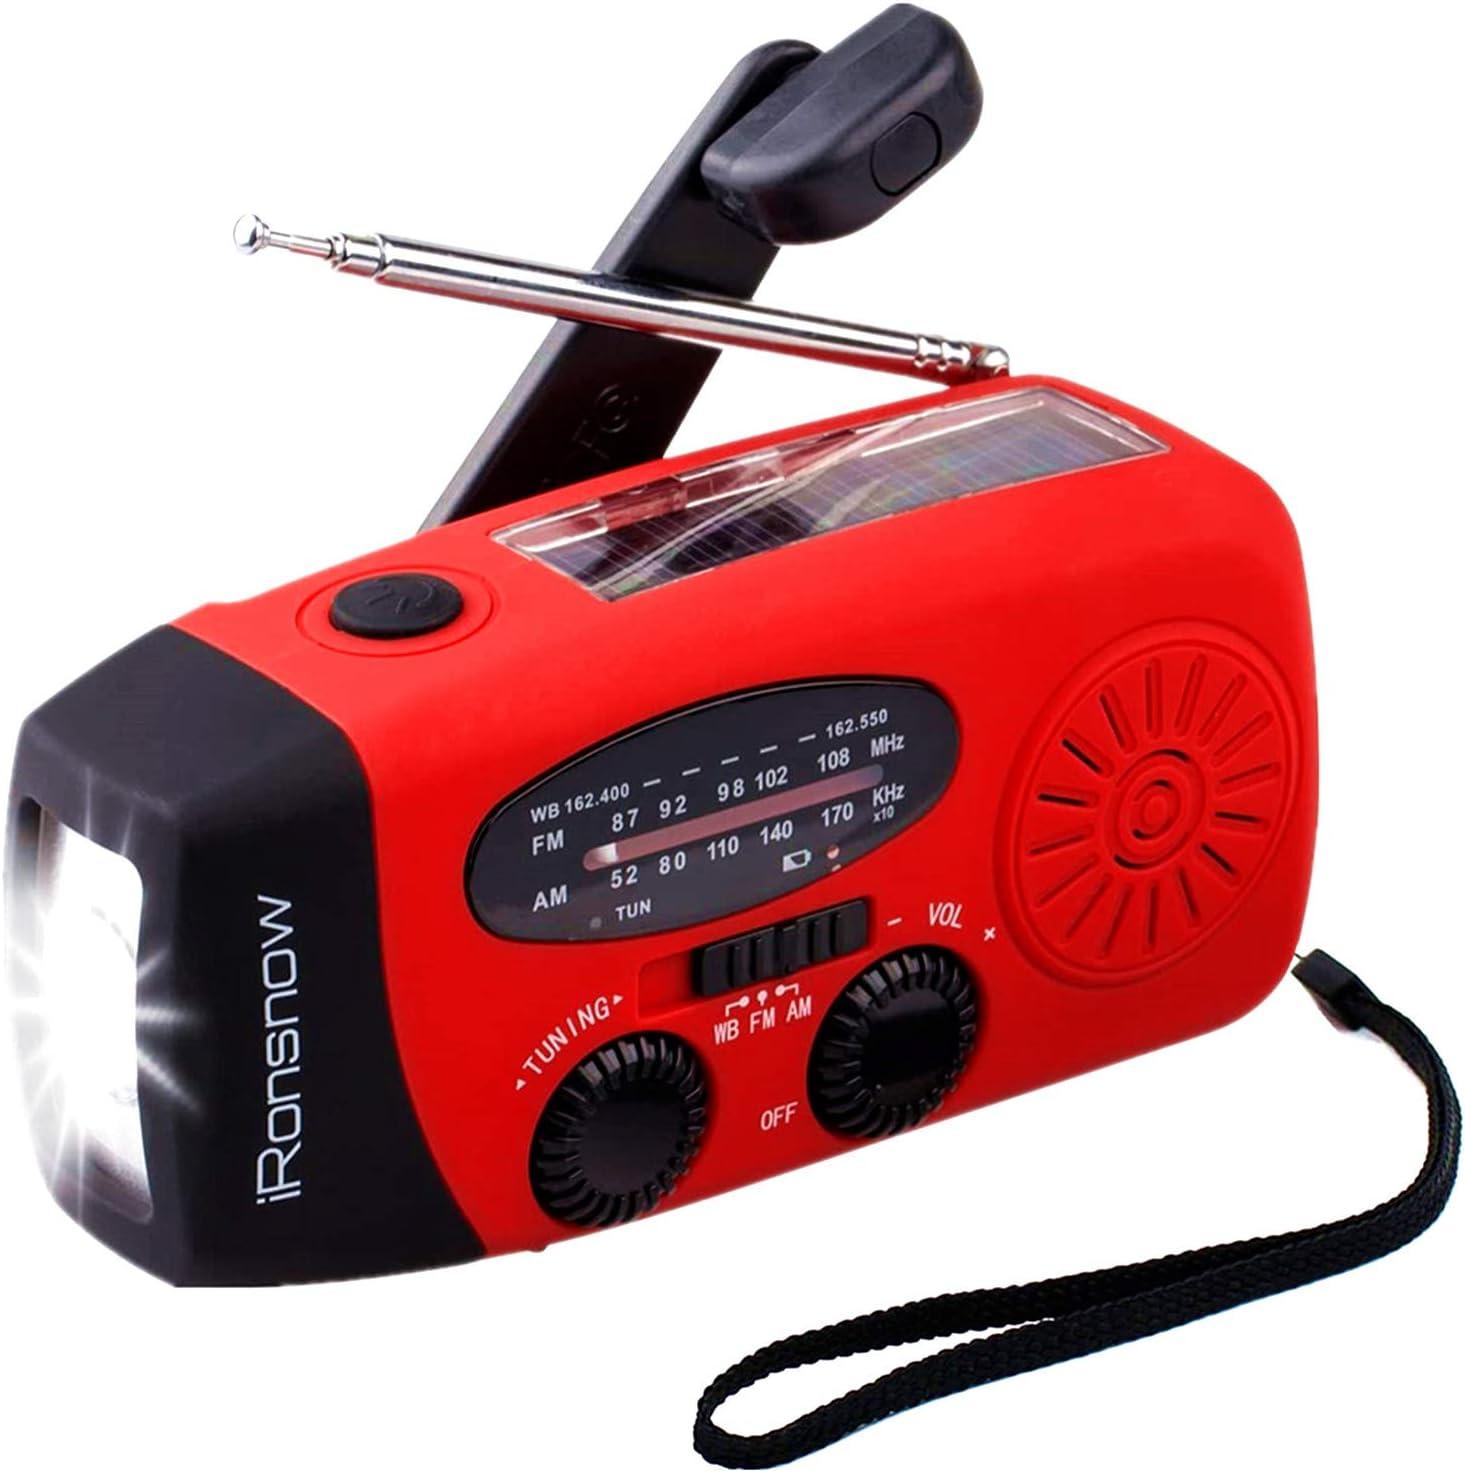 【2021 2000mAh】 iRonsnow IS-088+ Solar Hand Crank Radio AM/FM/NOAA/WB Weather Emergency Radio, Dynamo LED Flashlight 2000mAh Power Bank for iPhone/Android Smart Phone (Red)